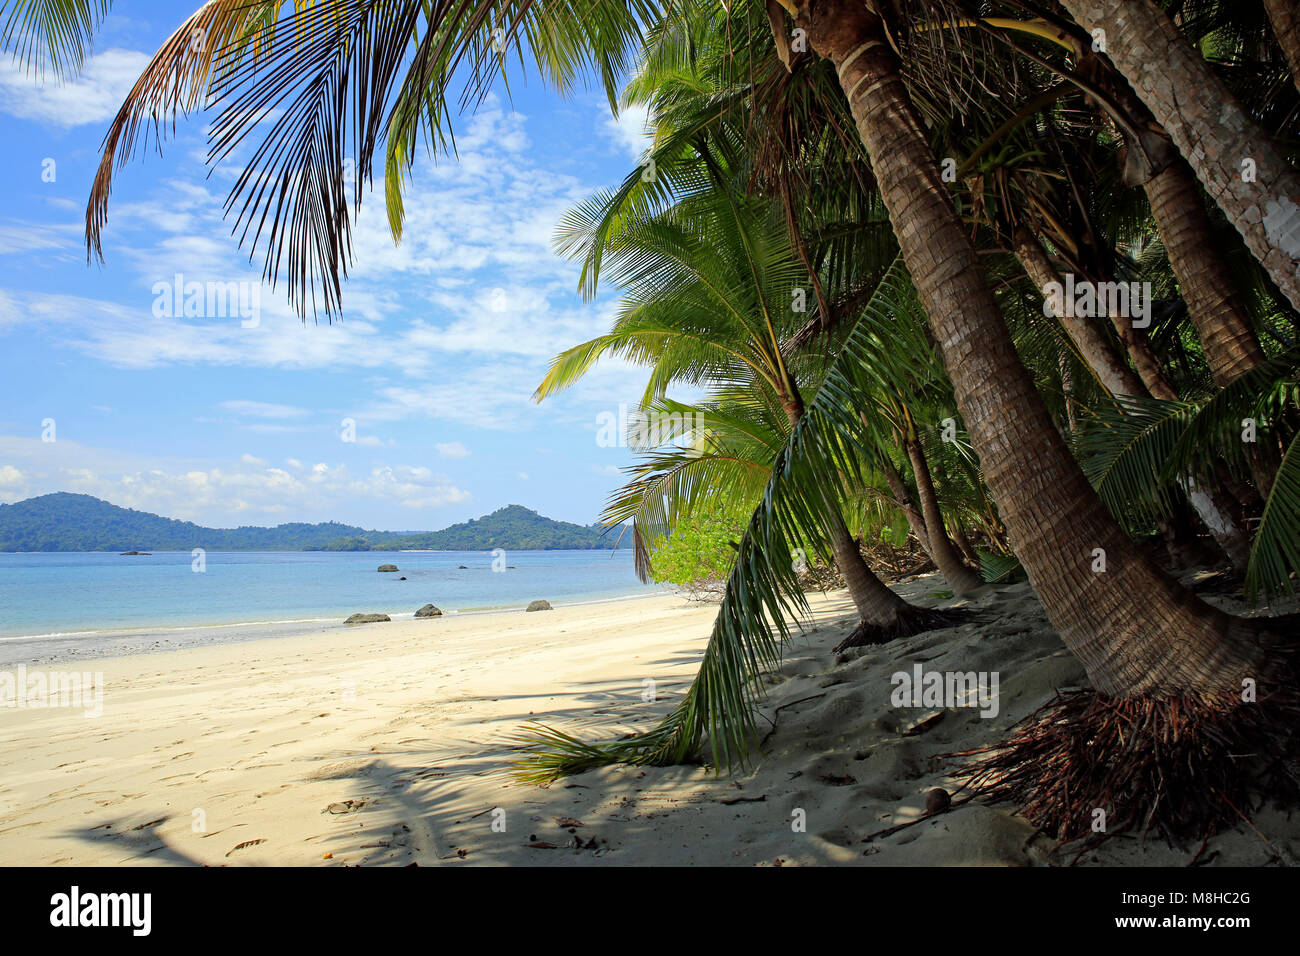 Tropical Beach of Coibita, aka Rancheria, with Isla Coiba in the Background. Coiba National Park, Panama - Stock Image